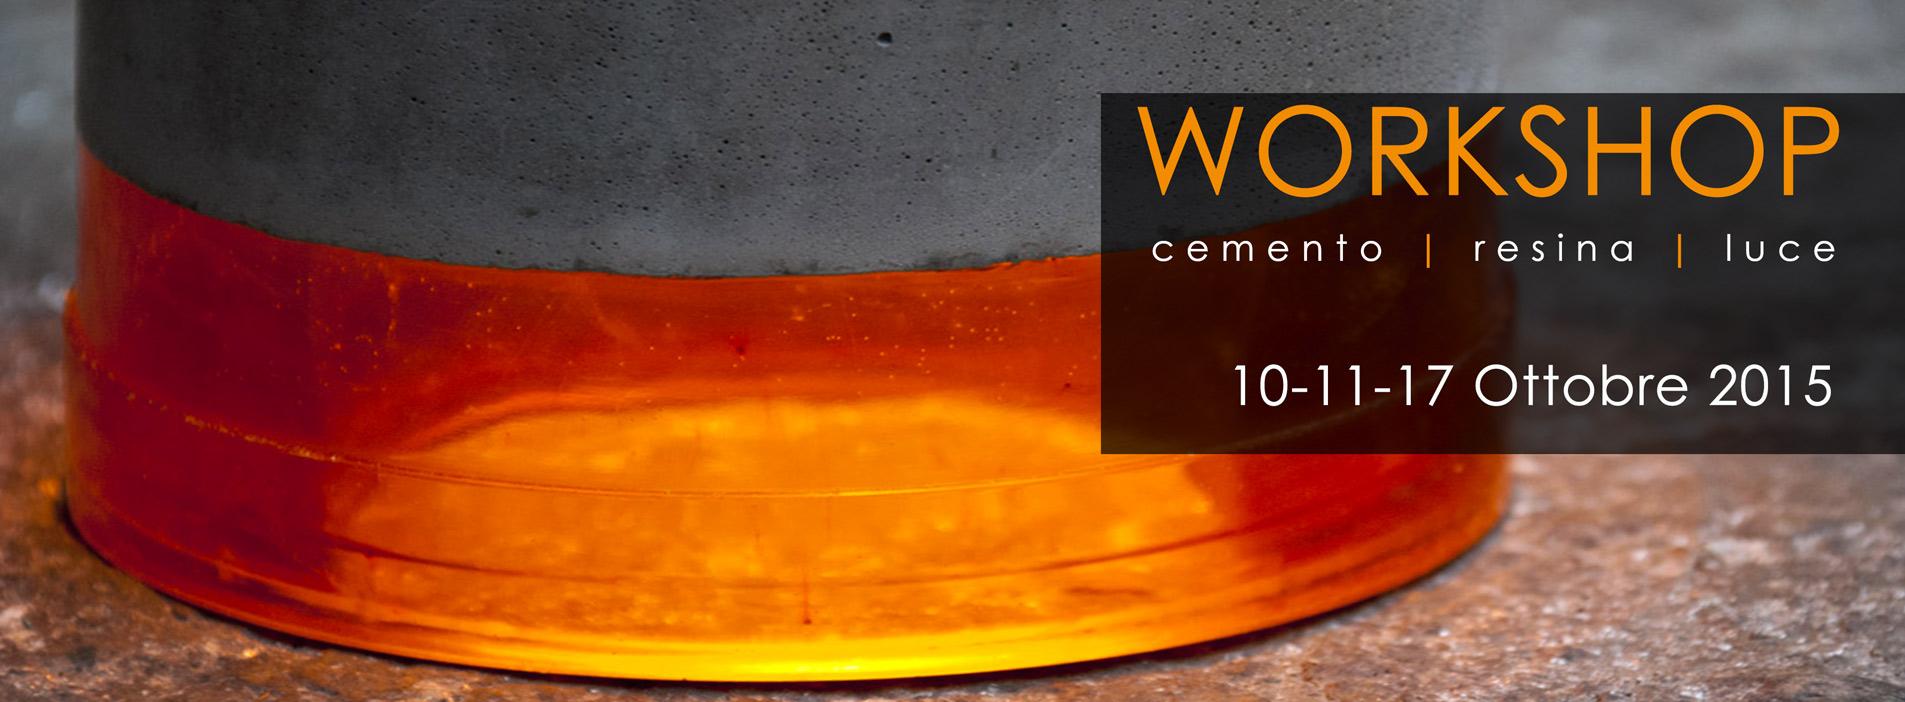 WORKSHOP Cemento+Resina+Luce